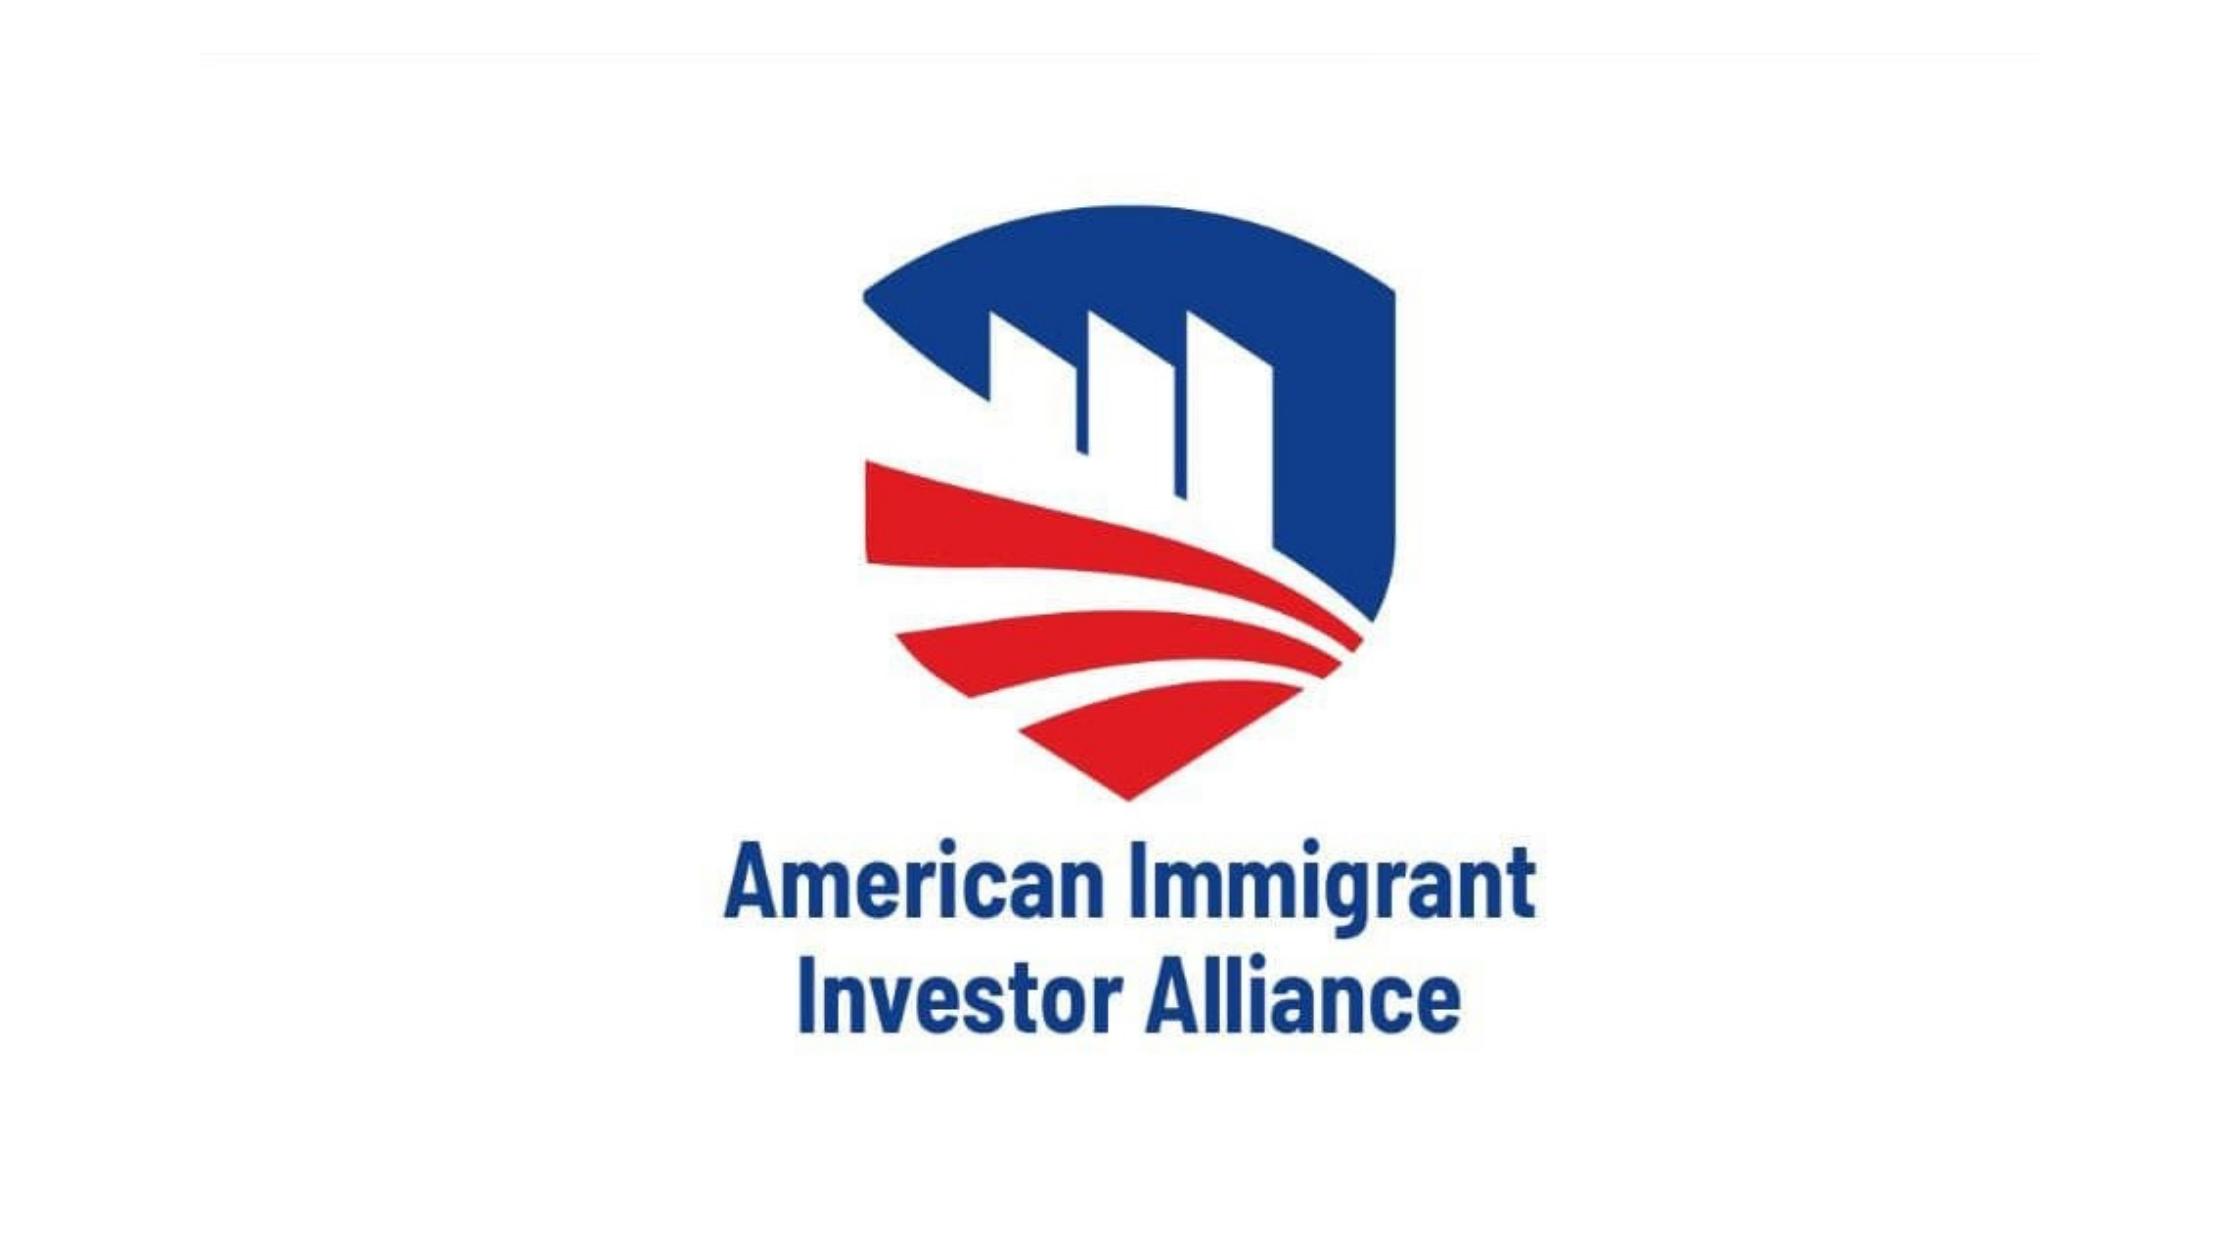 IIUSA Welcomes New Investor-Focused Advocacy Organization